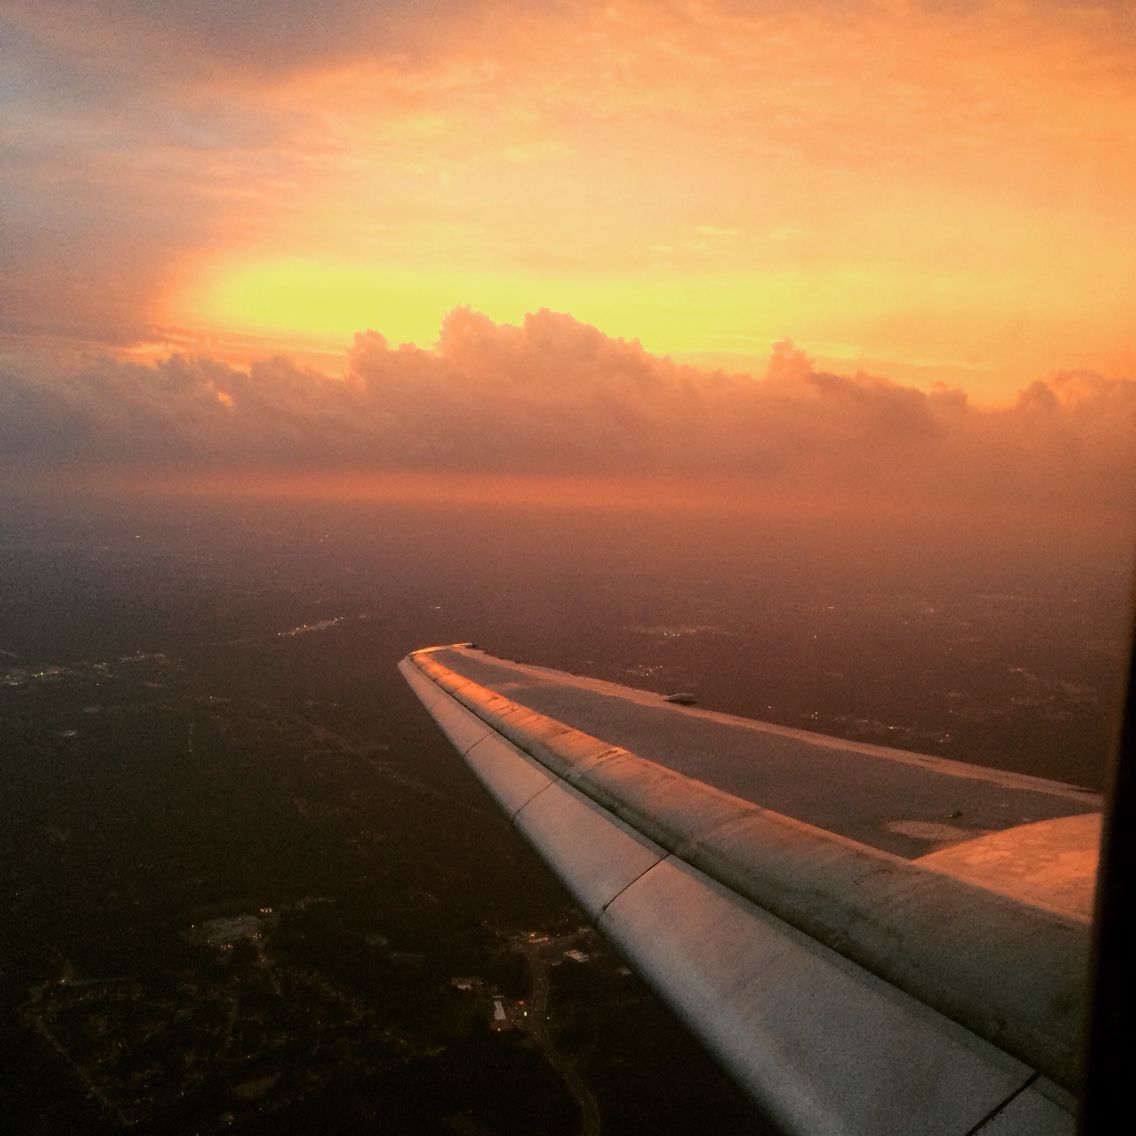 Pin by Lara Hart on Adventure Airplane view, Adventure